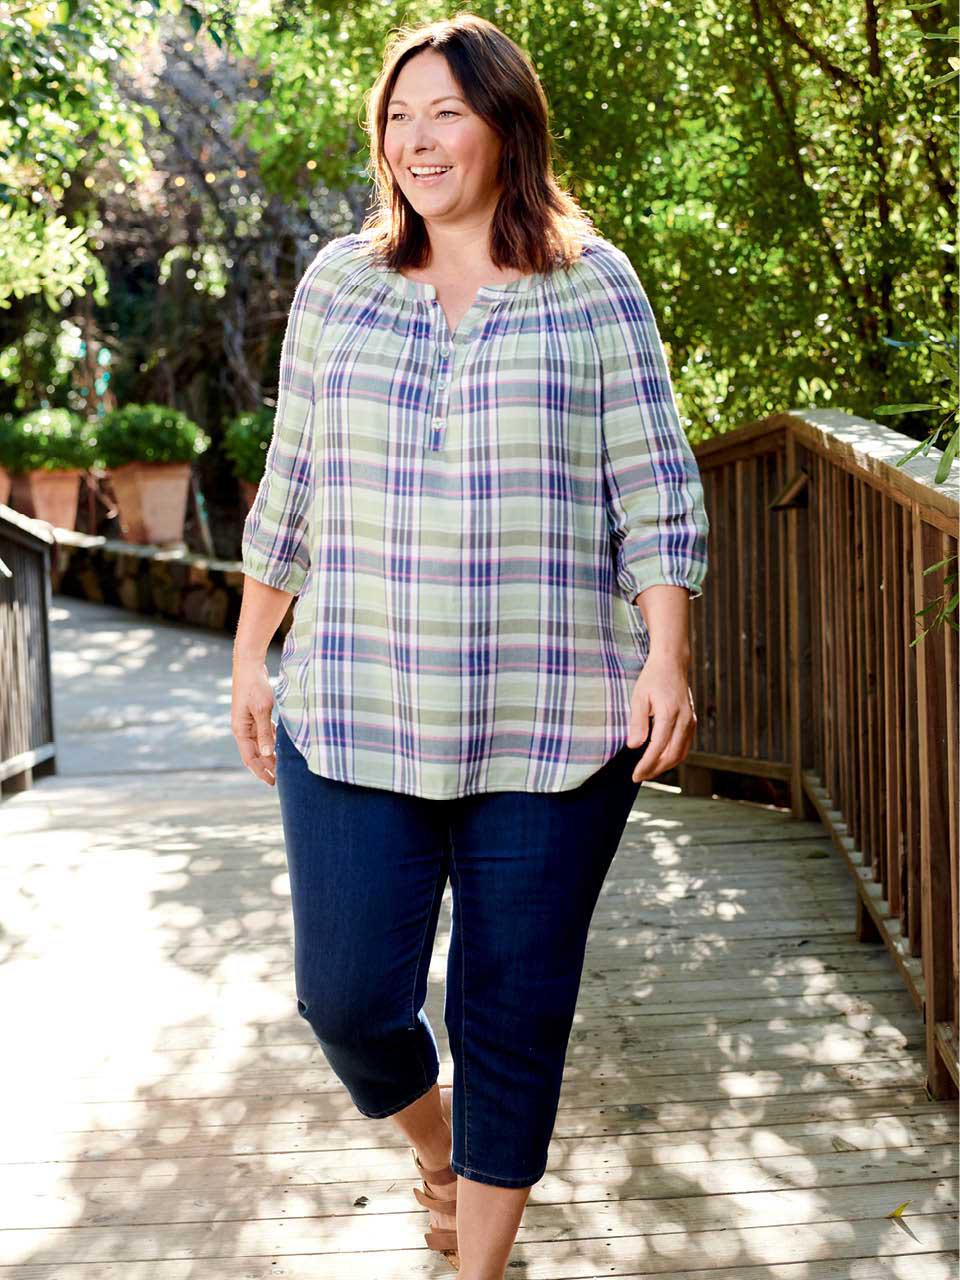 Plus Size Women\'s Clothing at Burlington MA | Catherines